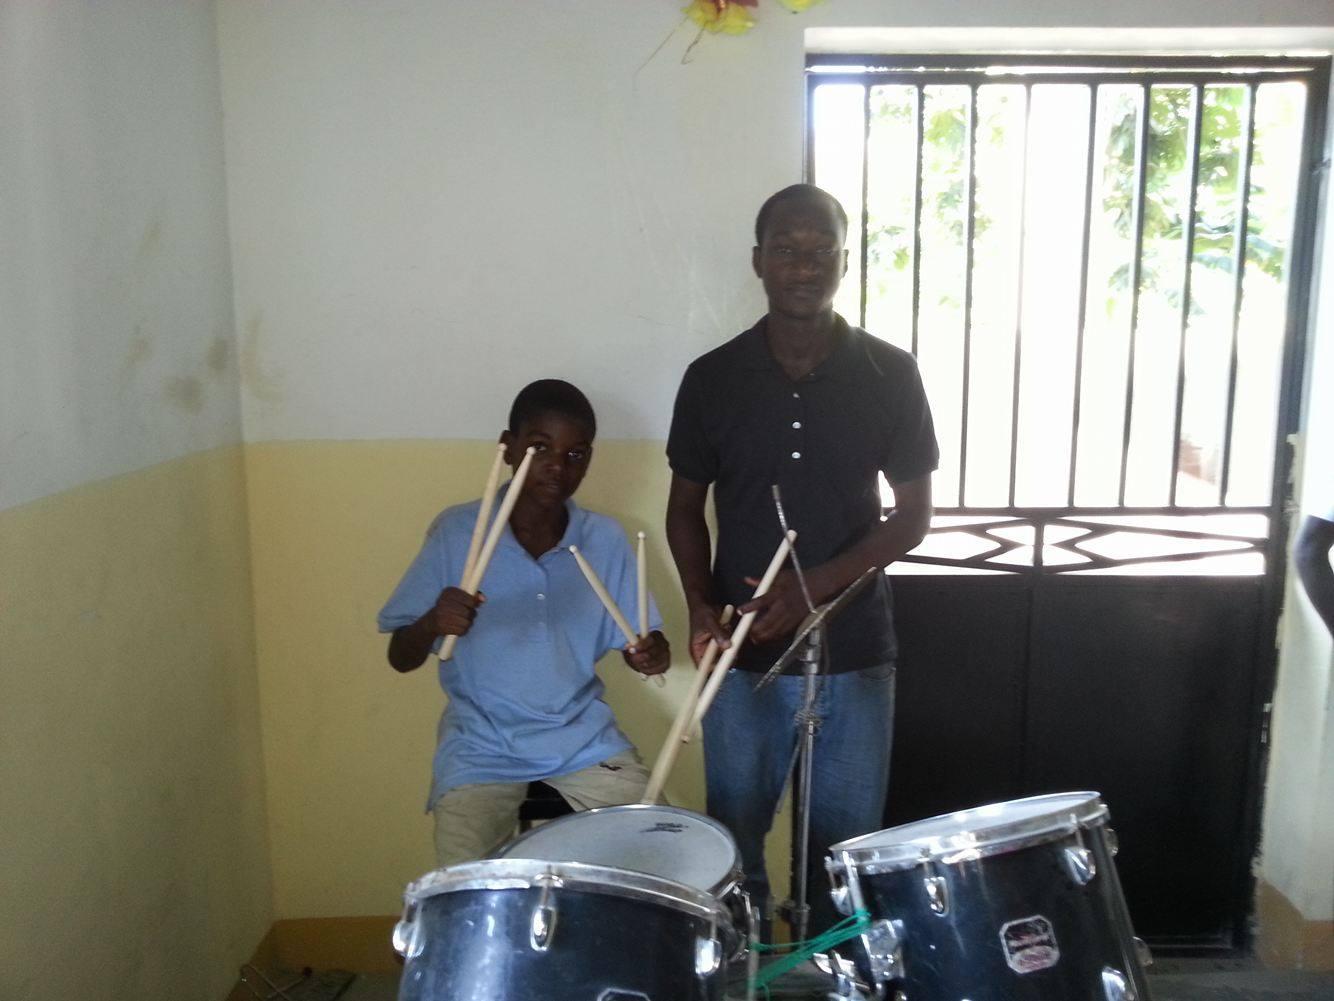 Carol drumsticks